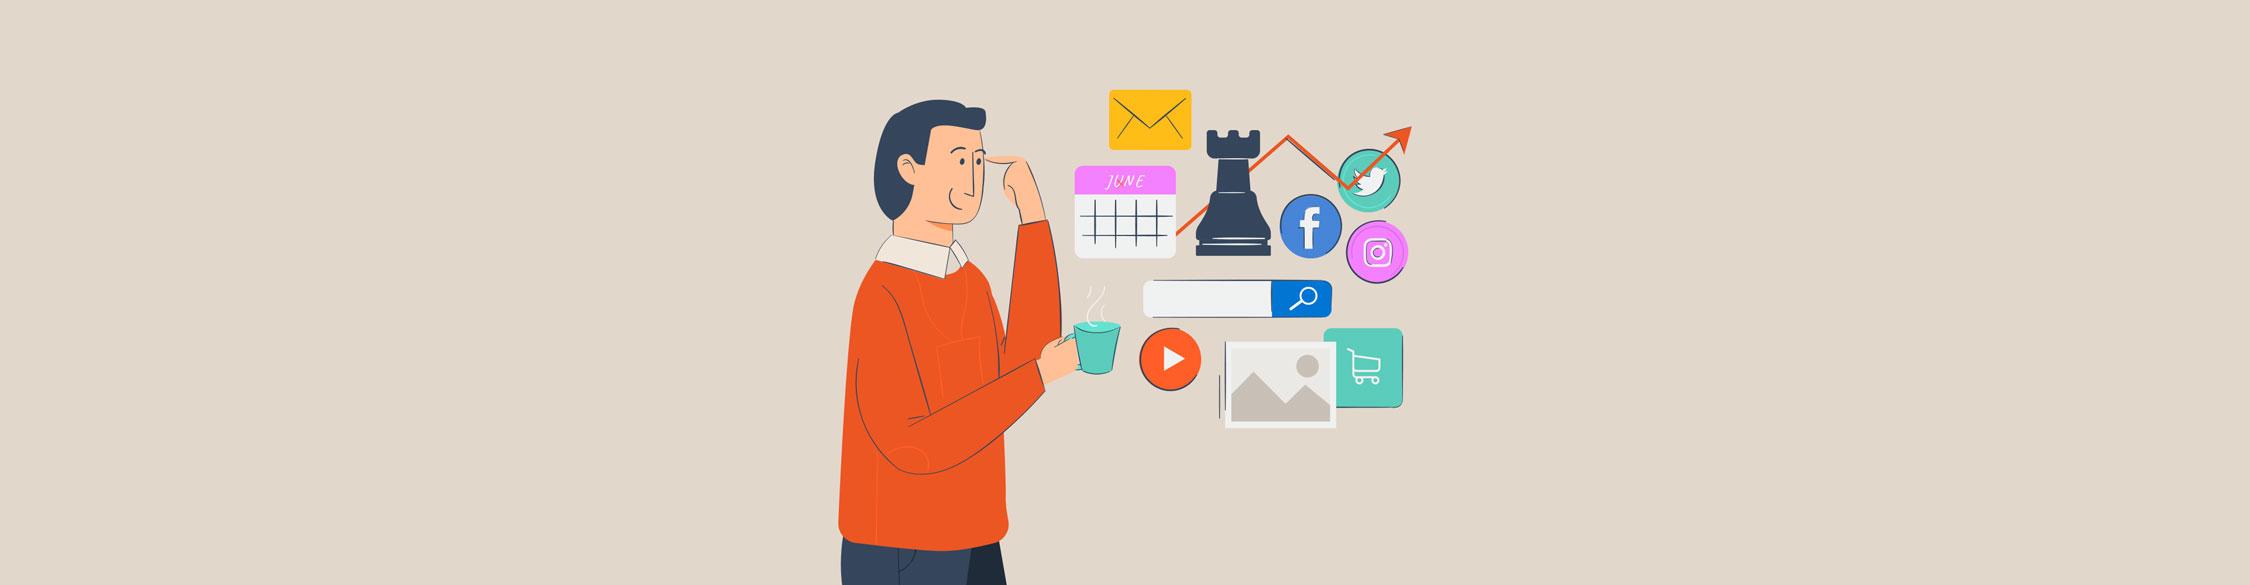 content marketing tips - header